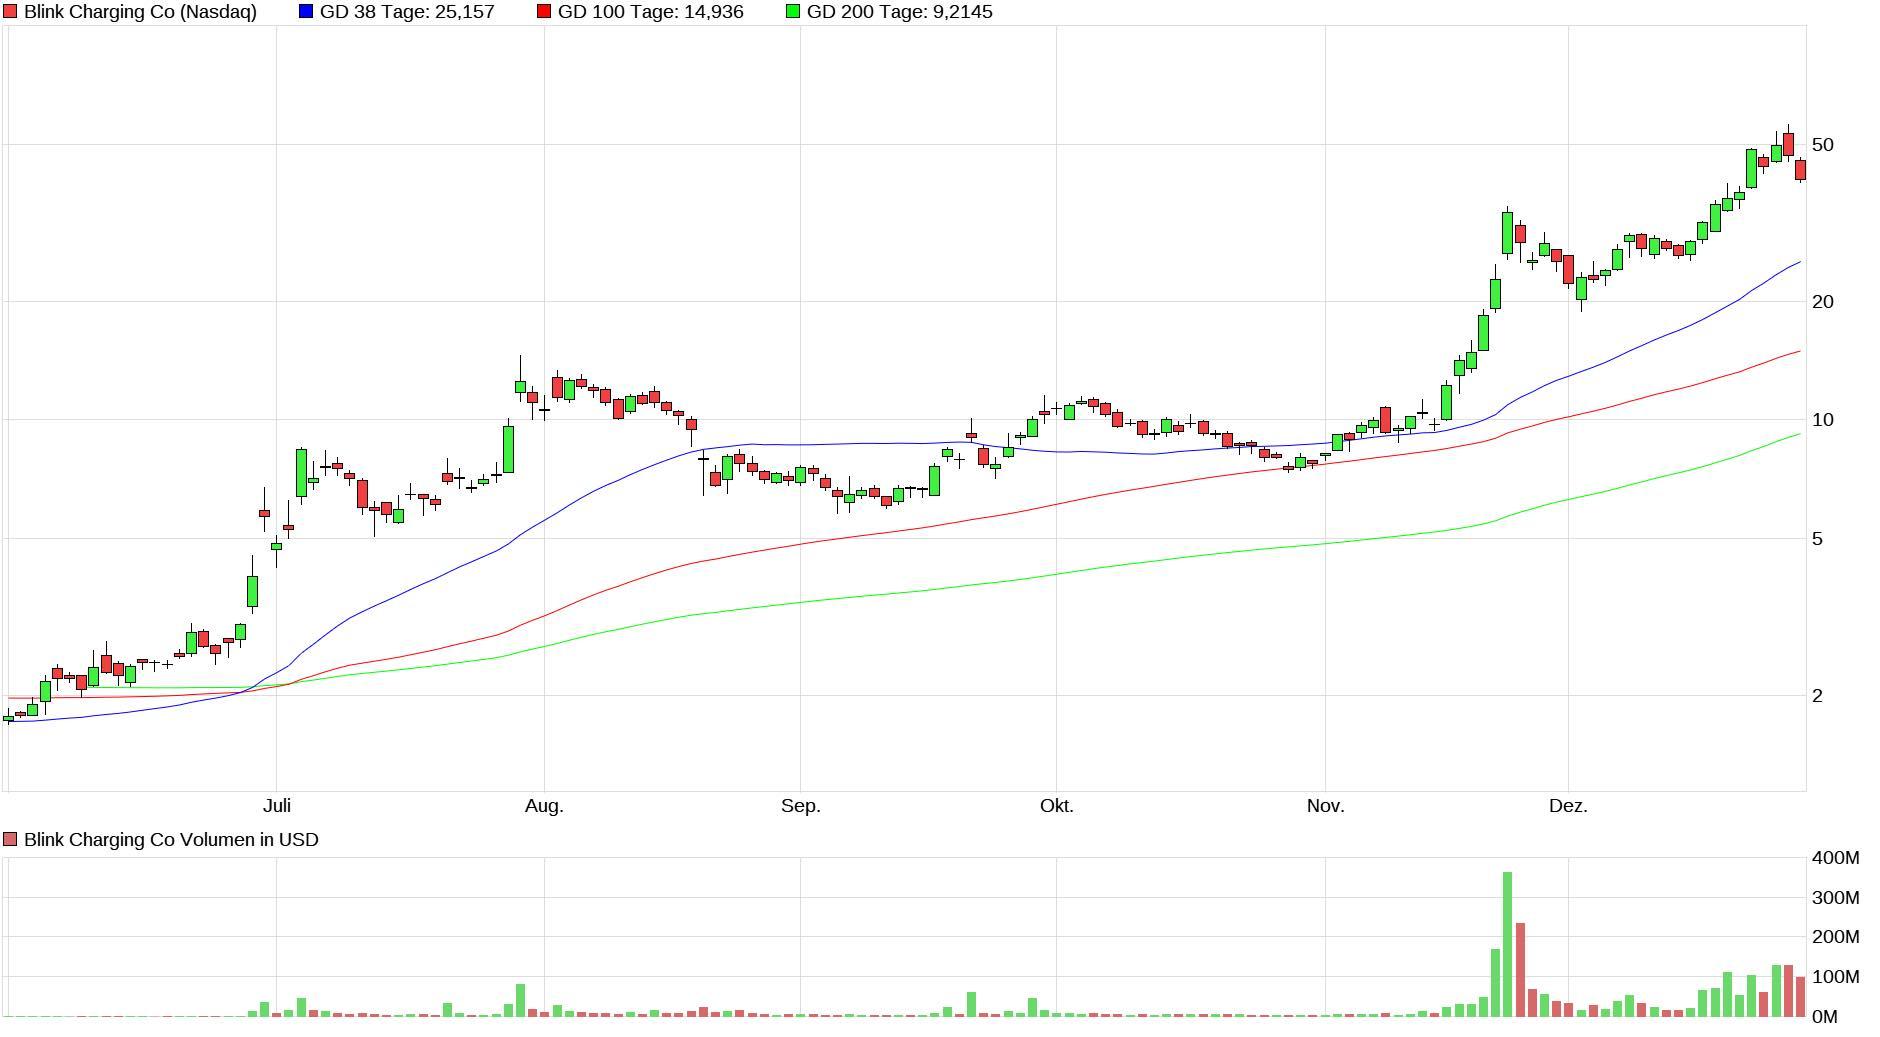 chart_halfyear_blinkchargingco.jpg